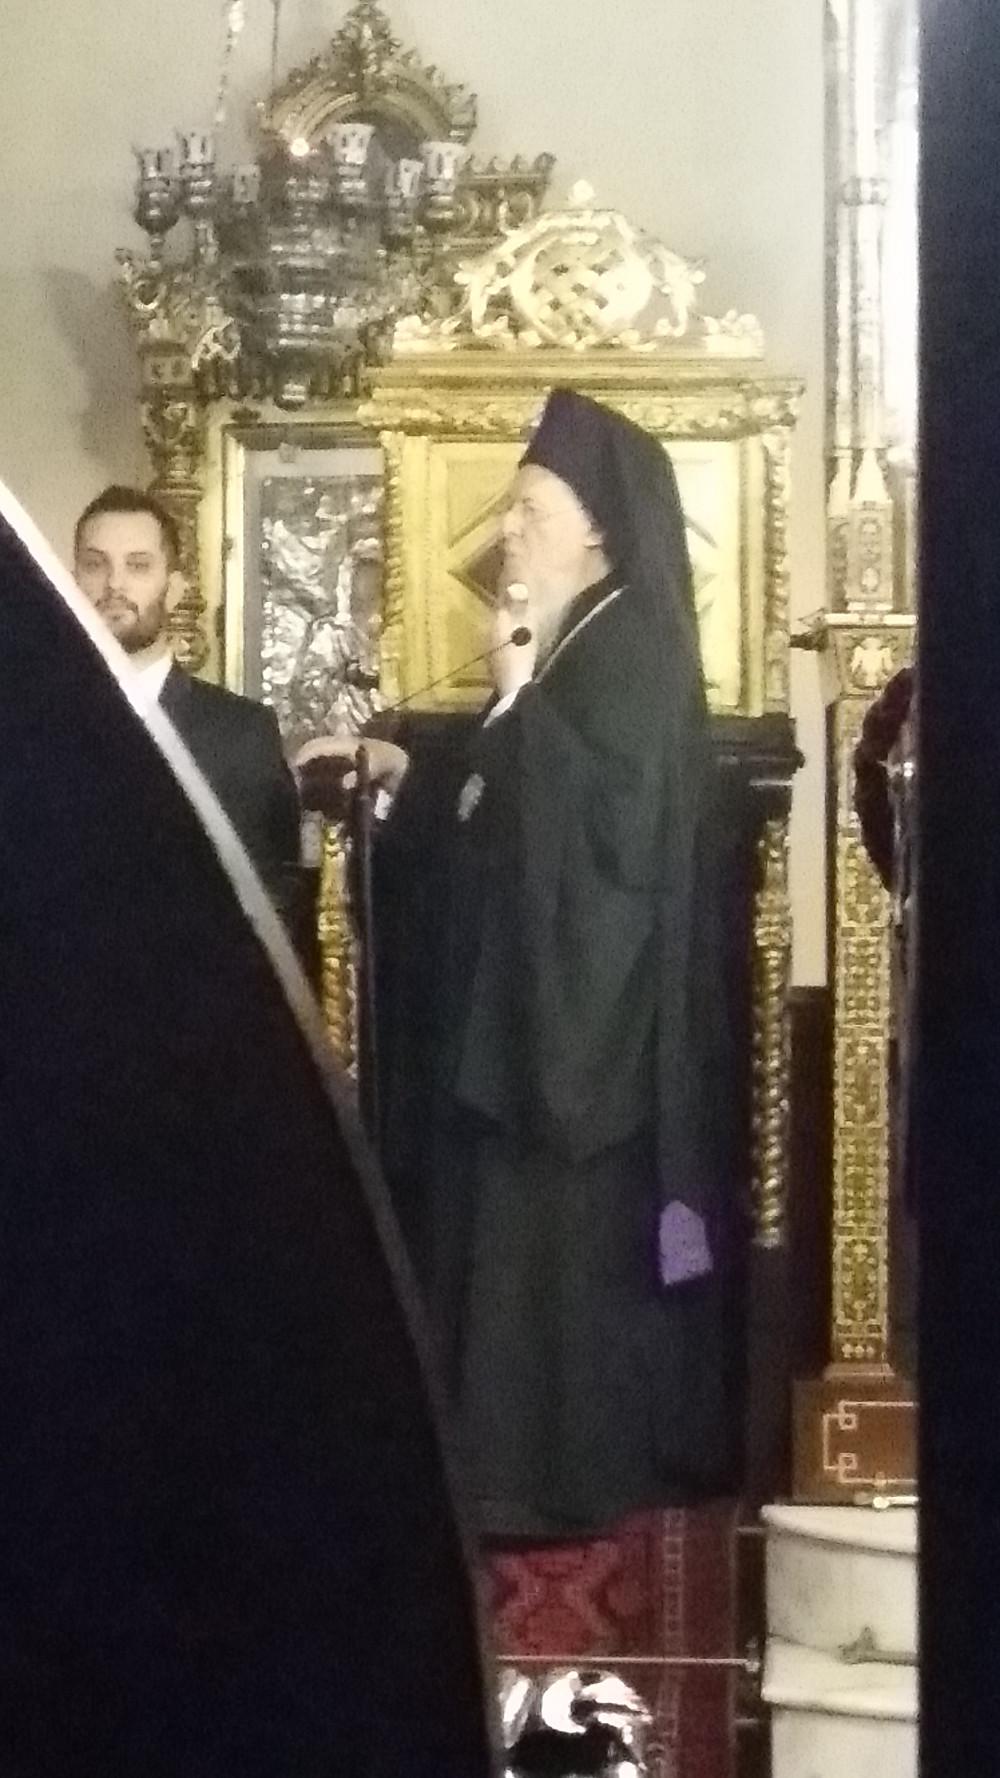 Greek Orthodox Ecumenical Patrairch Bartholomew